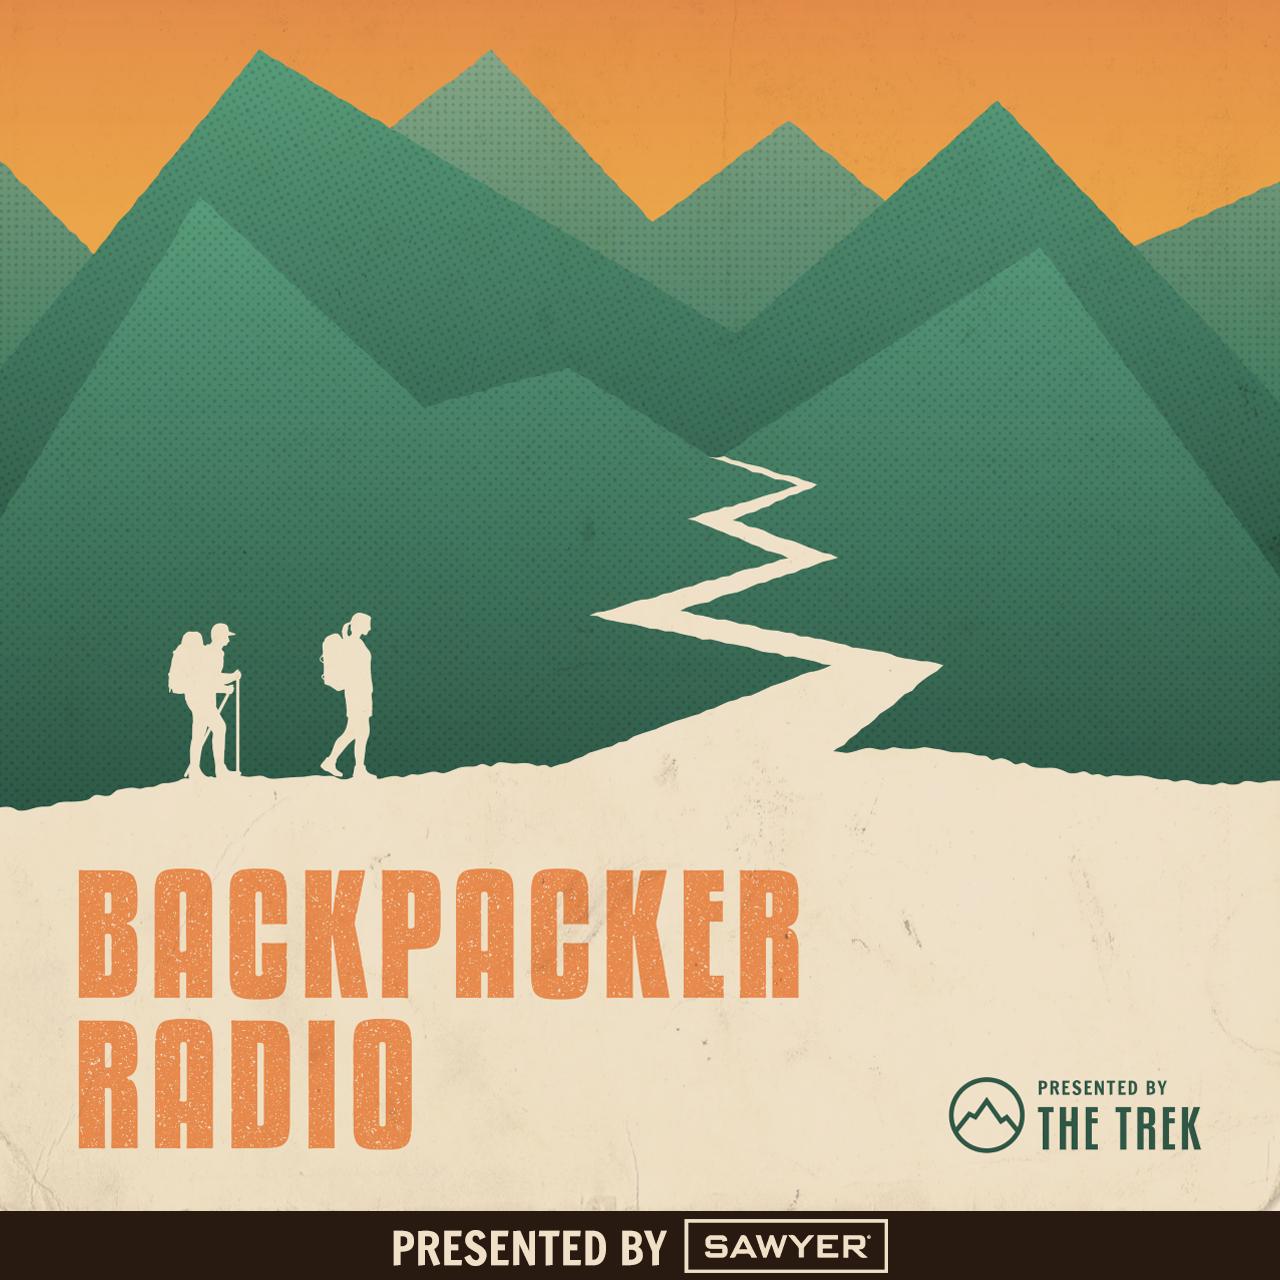 Backpacker Radio show art